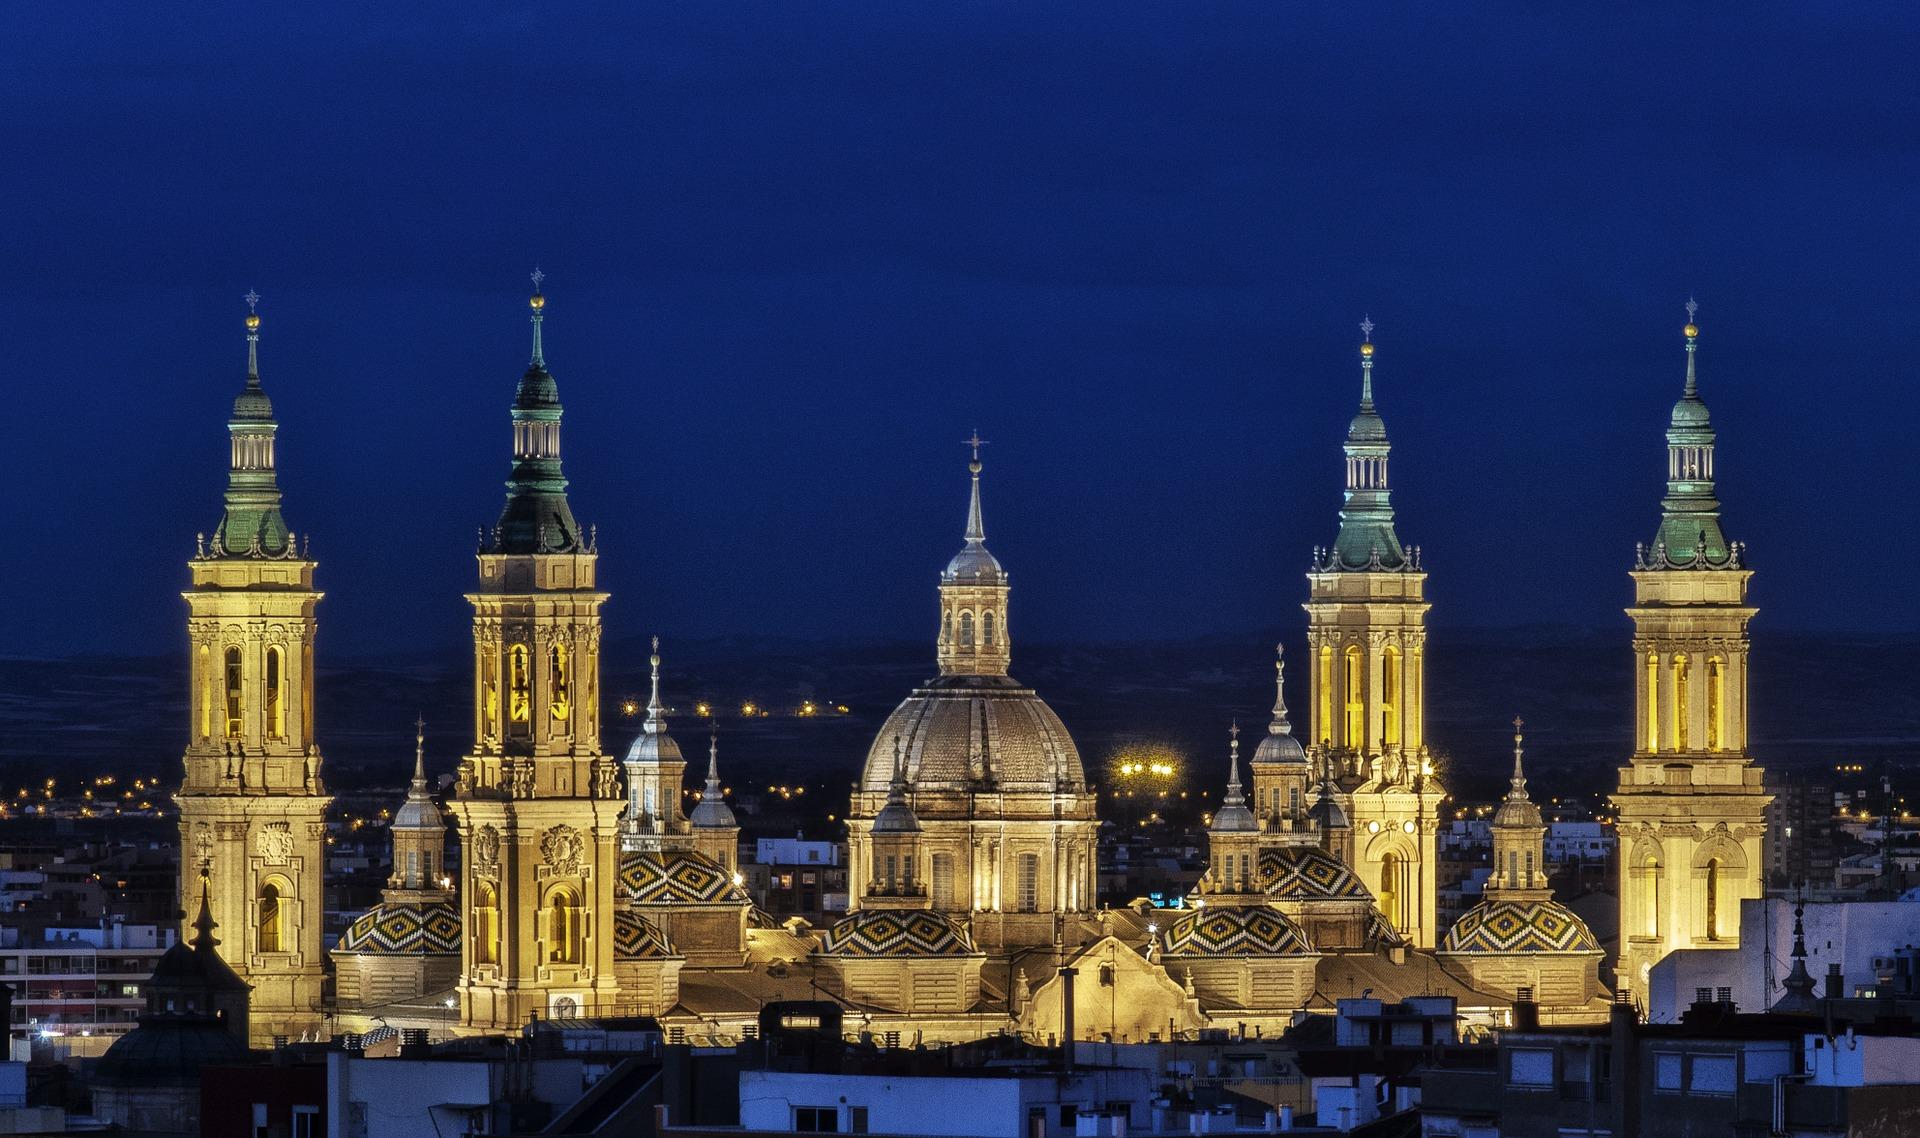 Zaragoza Basilica Pilar